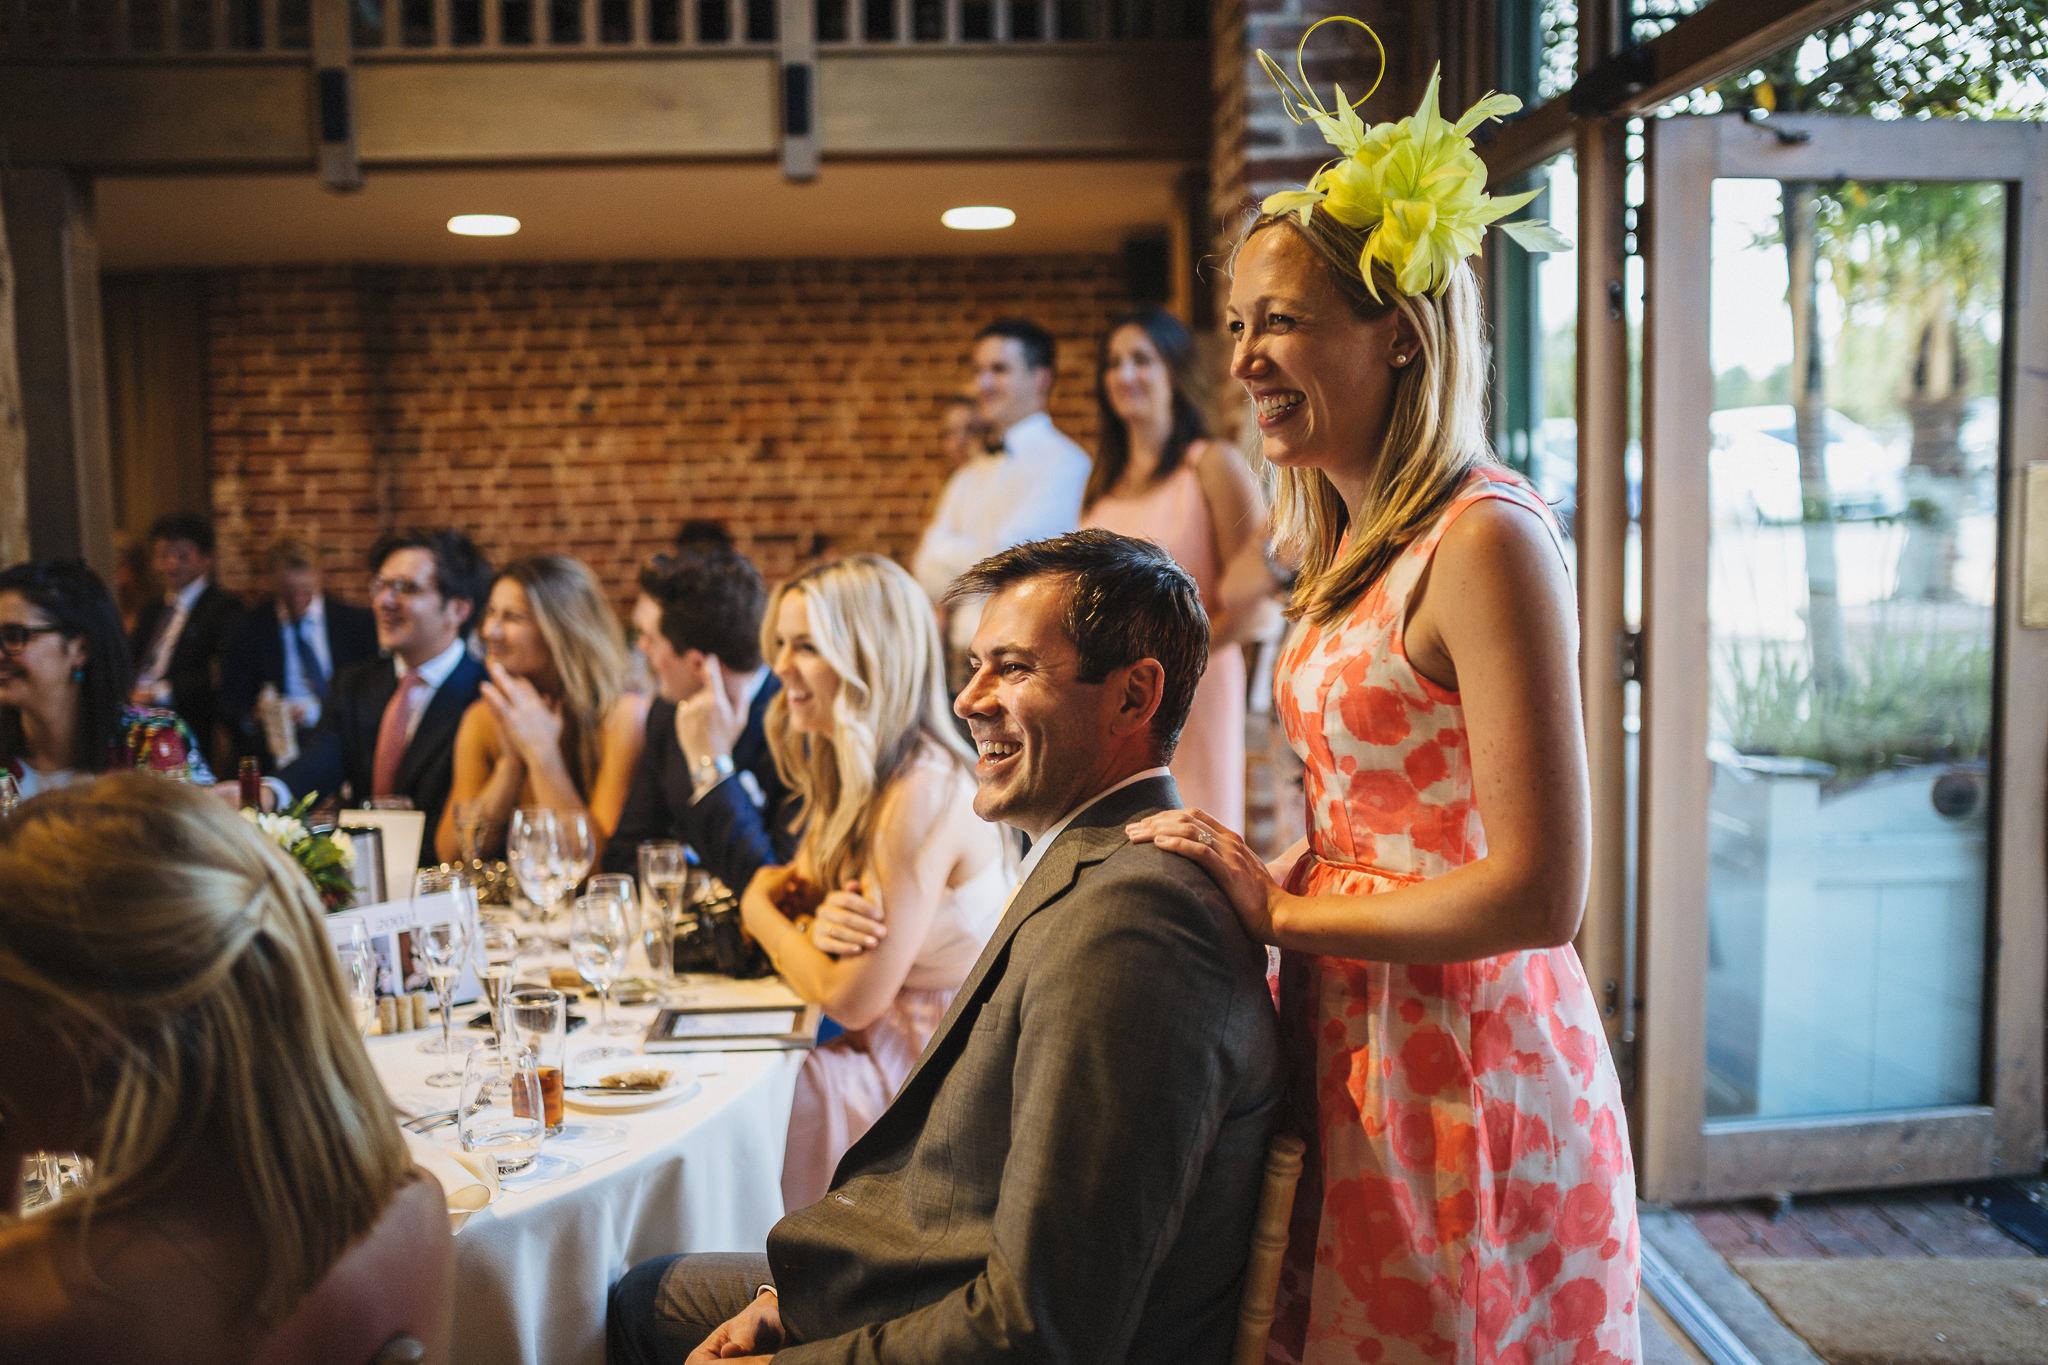 paul-marbrook-Gaynes-Park Wedding-Photographer-90123